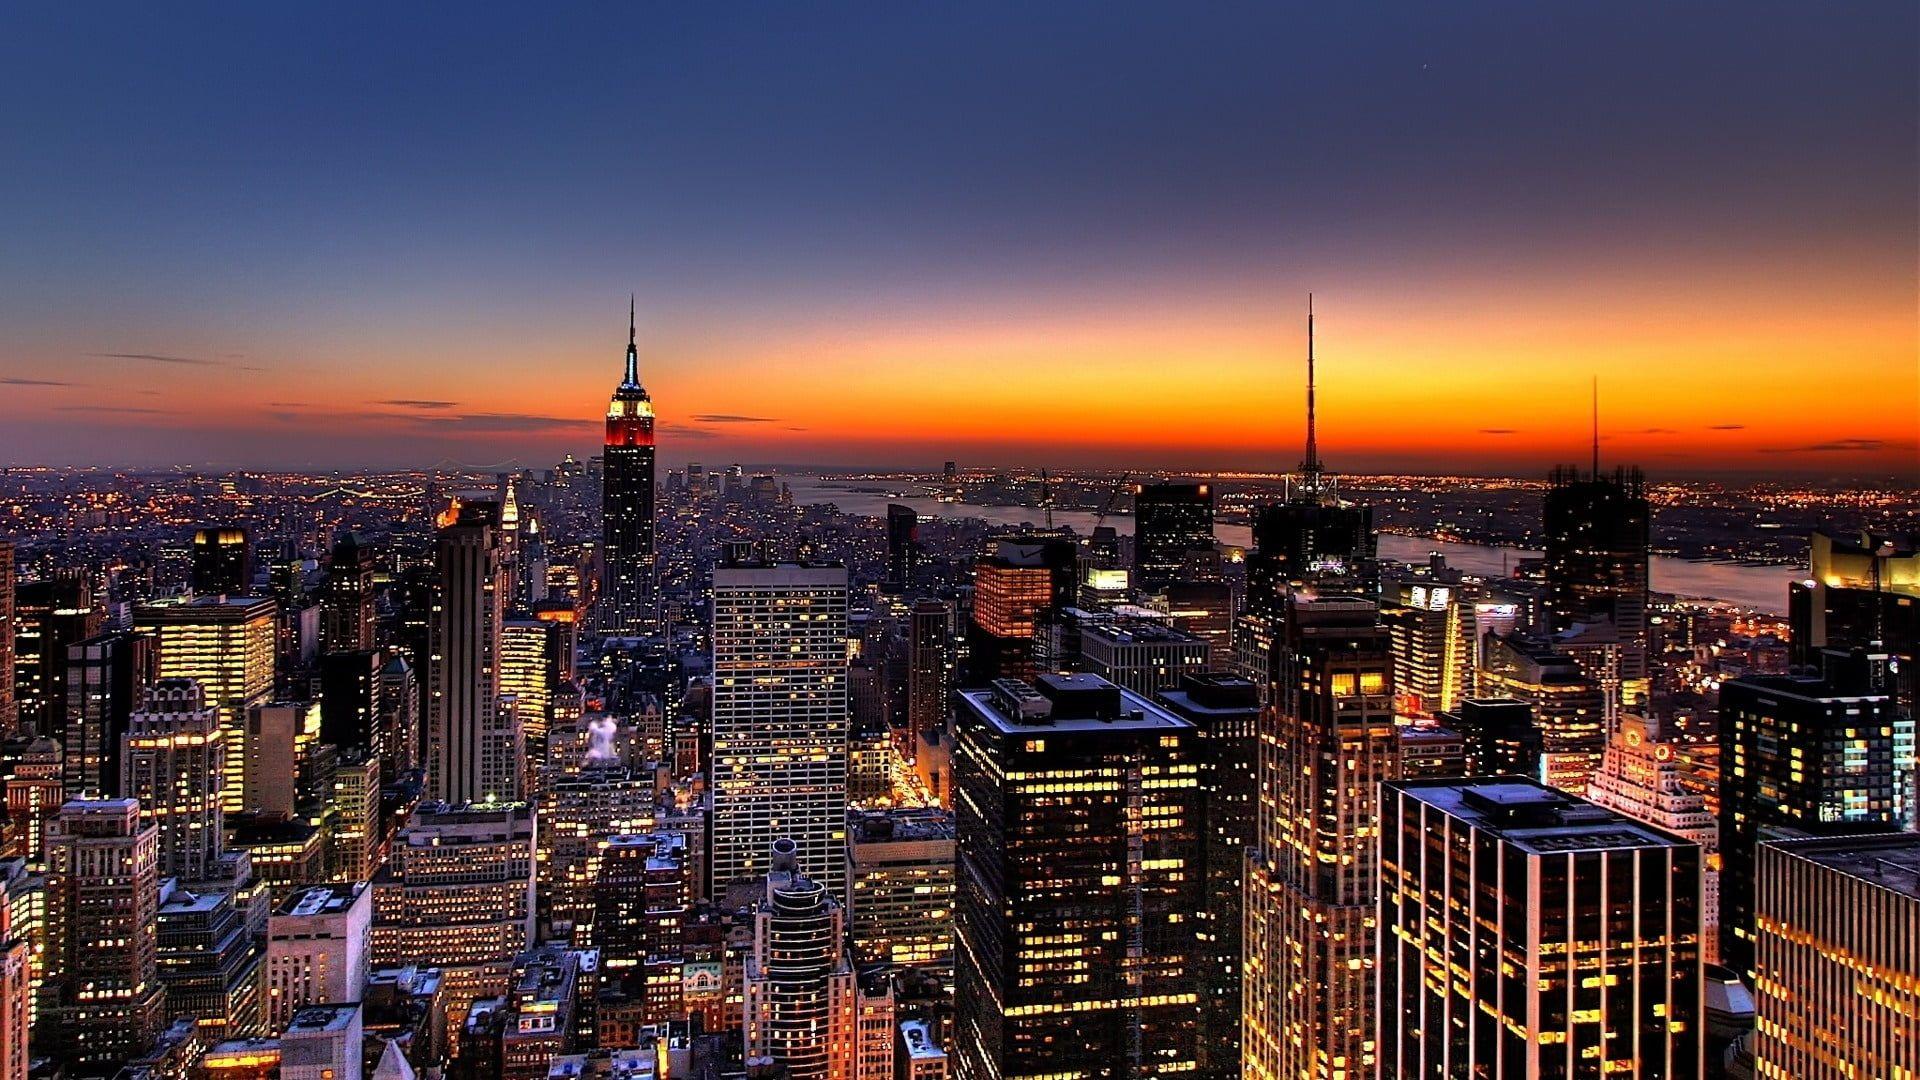 New York Night Skyscrapers Top View New York Wallpaper New York